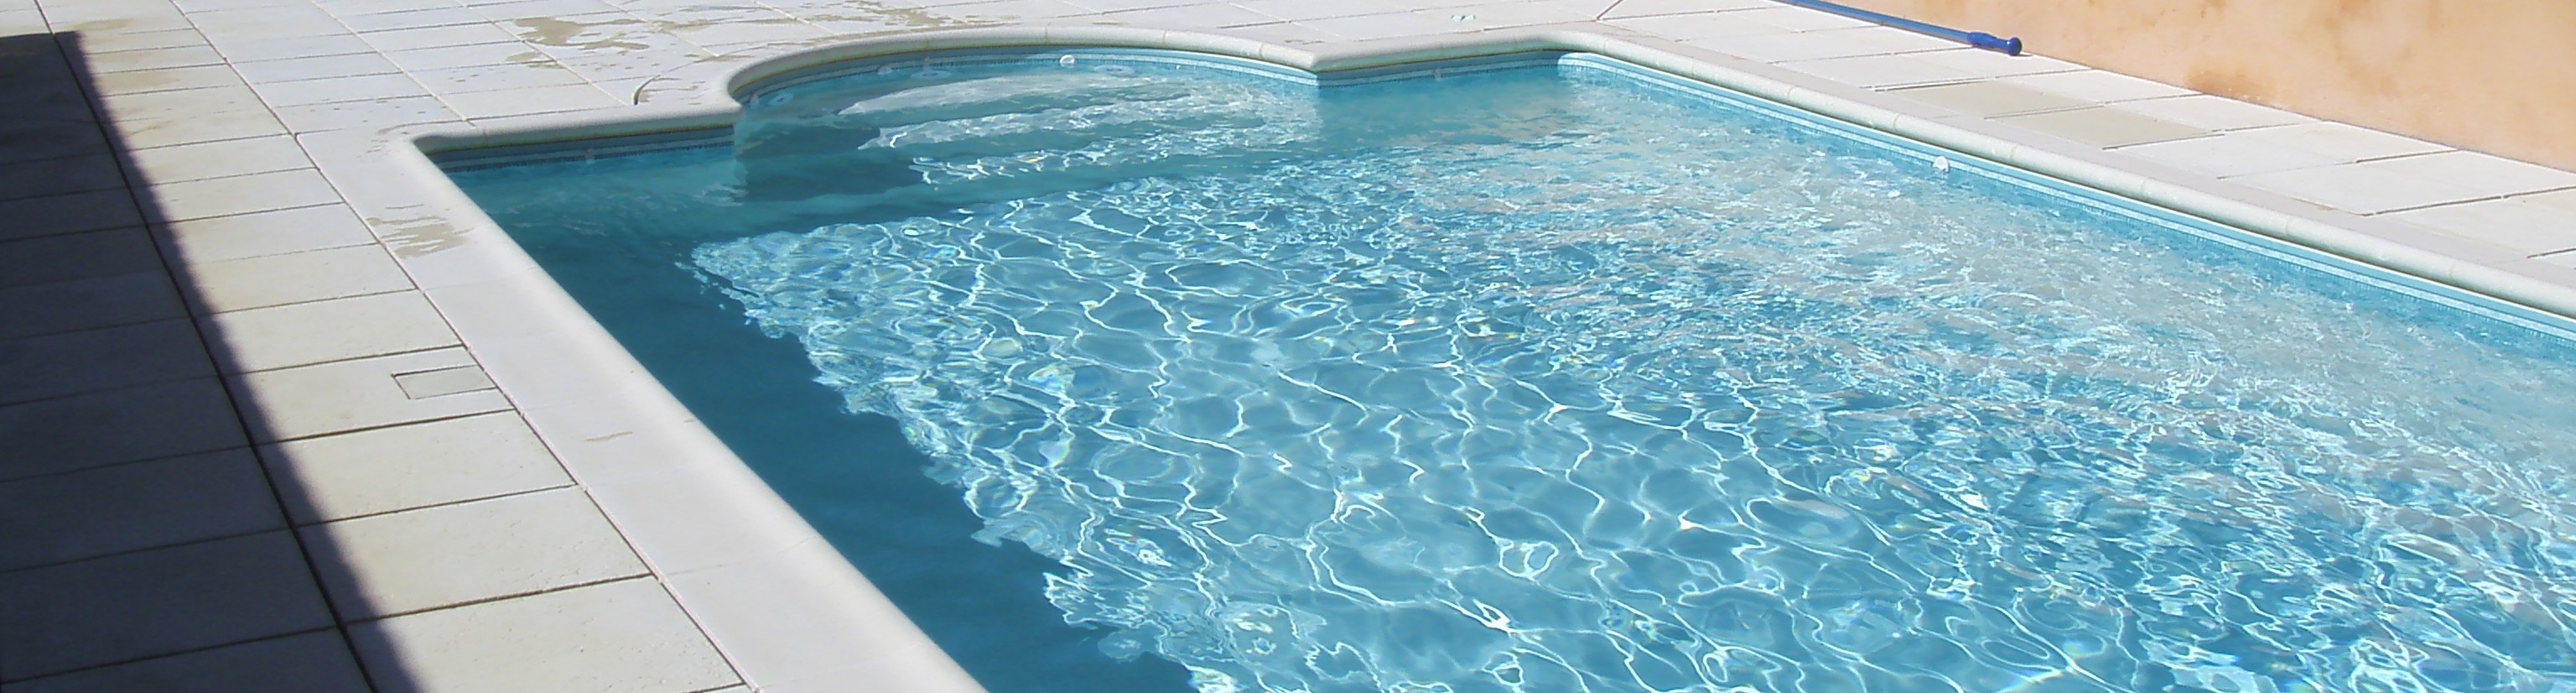 Terrassement pour piscine Aube, Marne, Seine et Marne